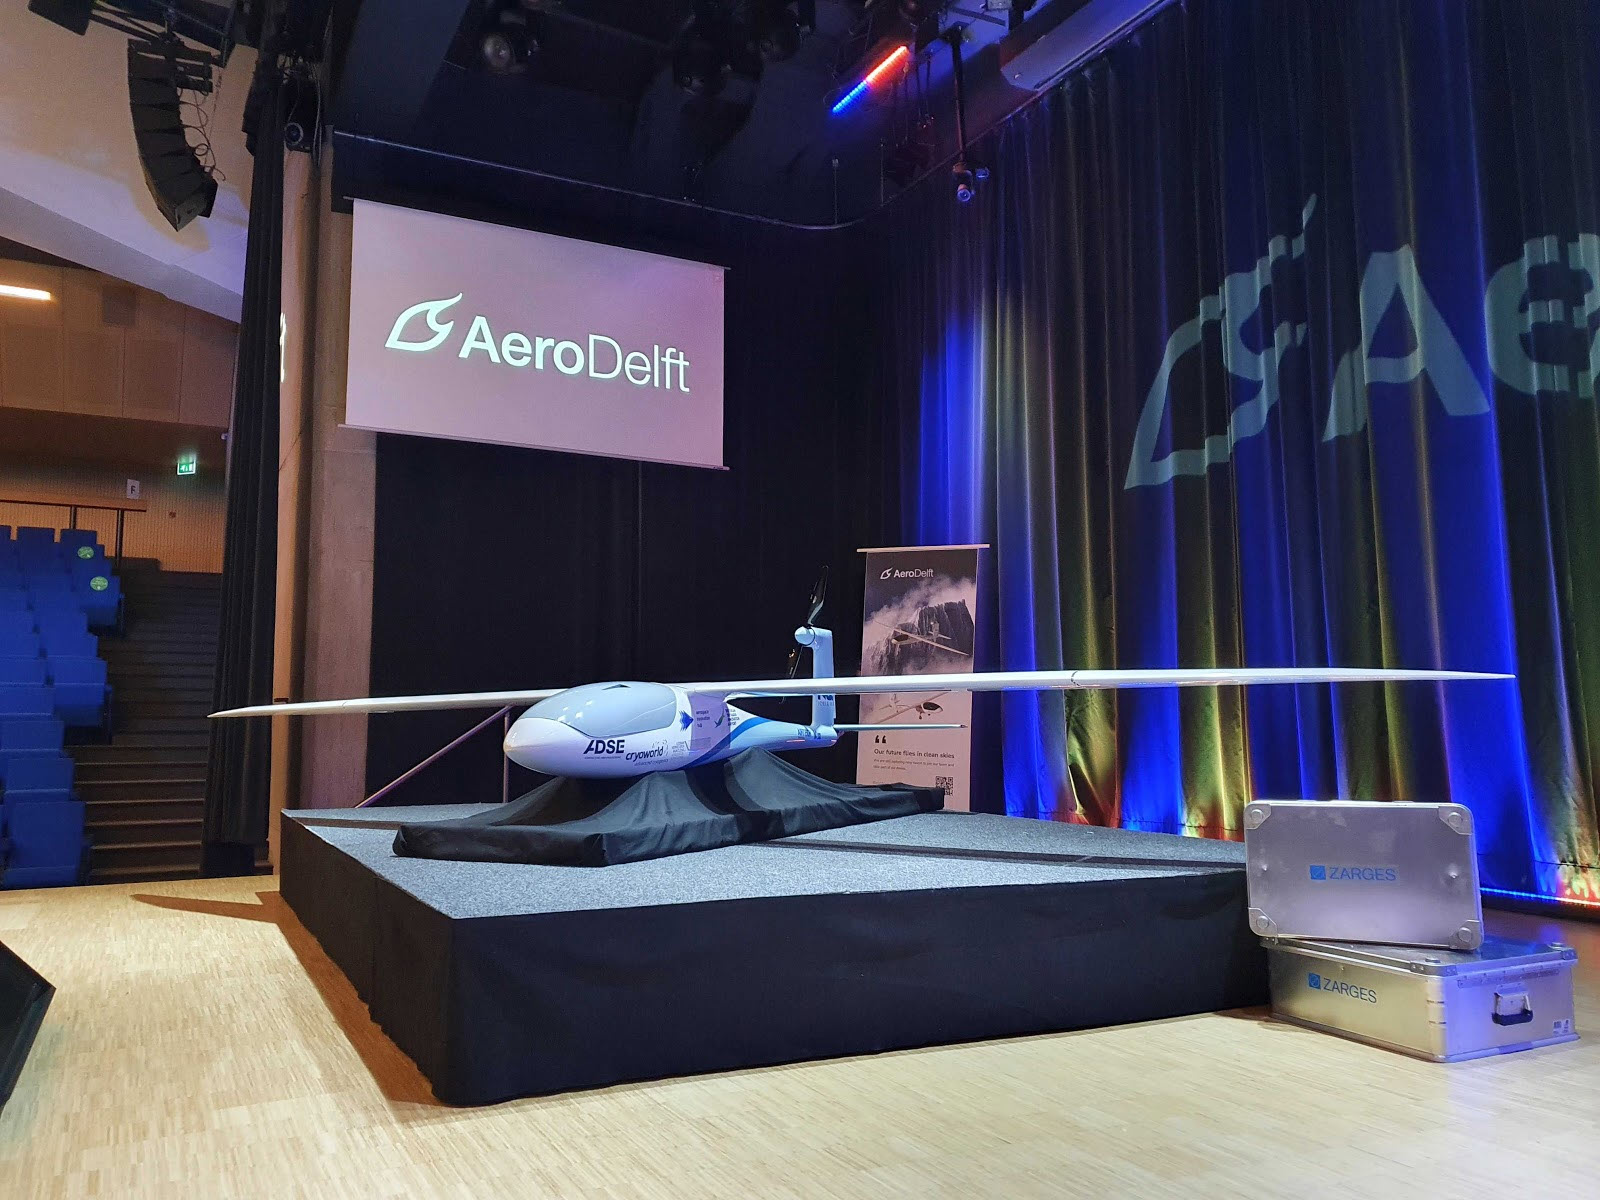 Delfter Studententeam enthüllt Wasserstoffflugzeug